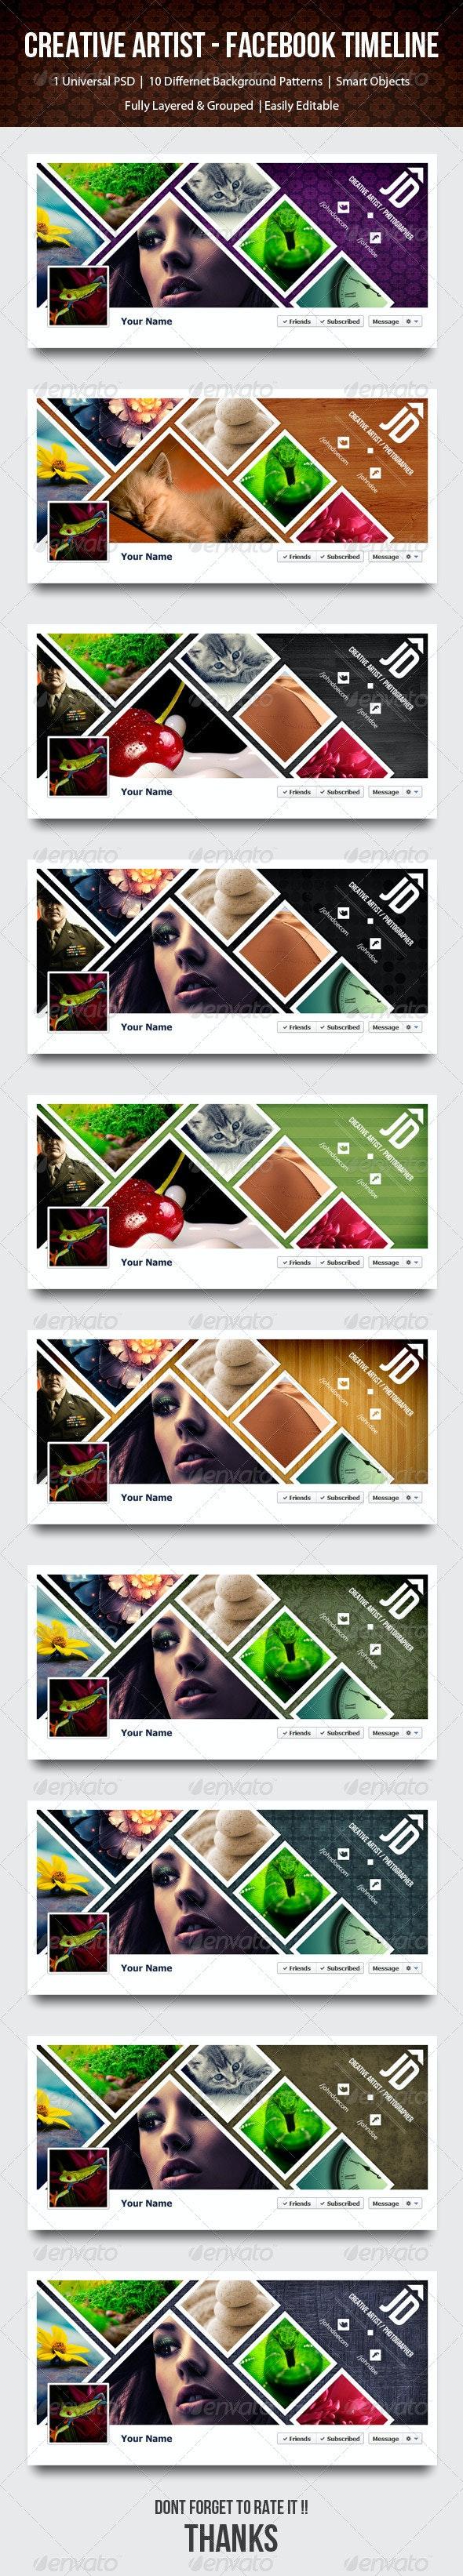 Creative Artist / Photographer Timeline - Facebook - Facebook Timeline Covers Social Media